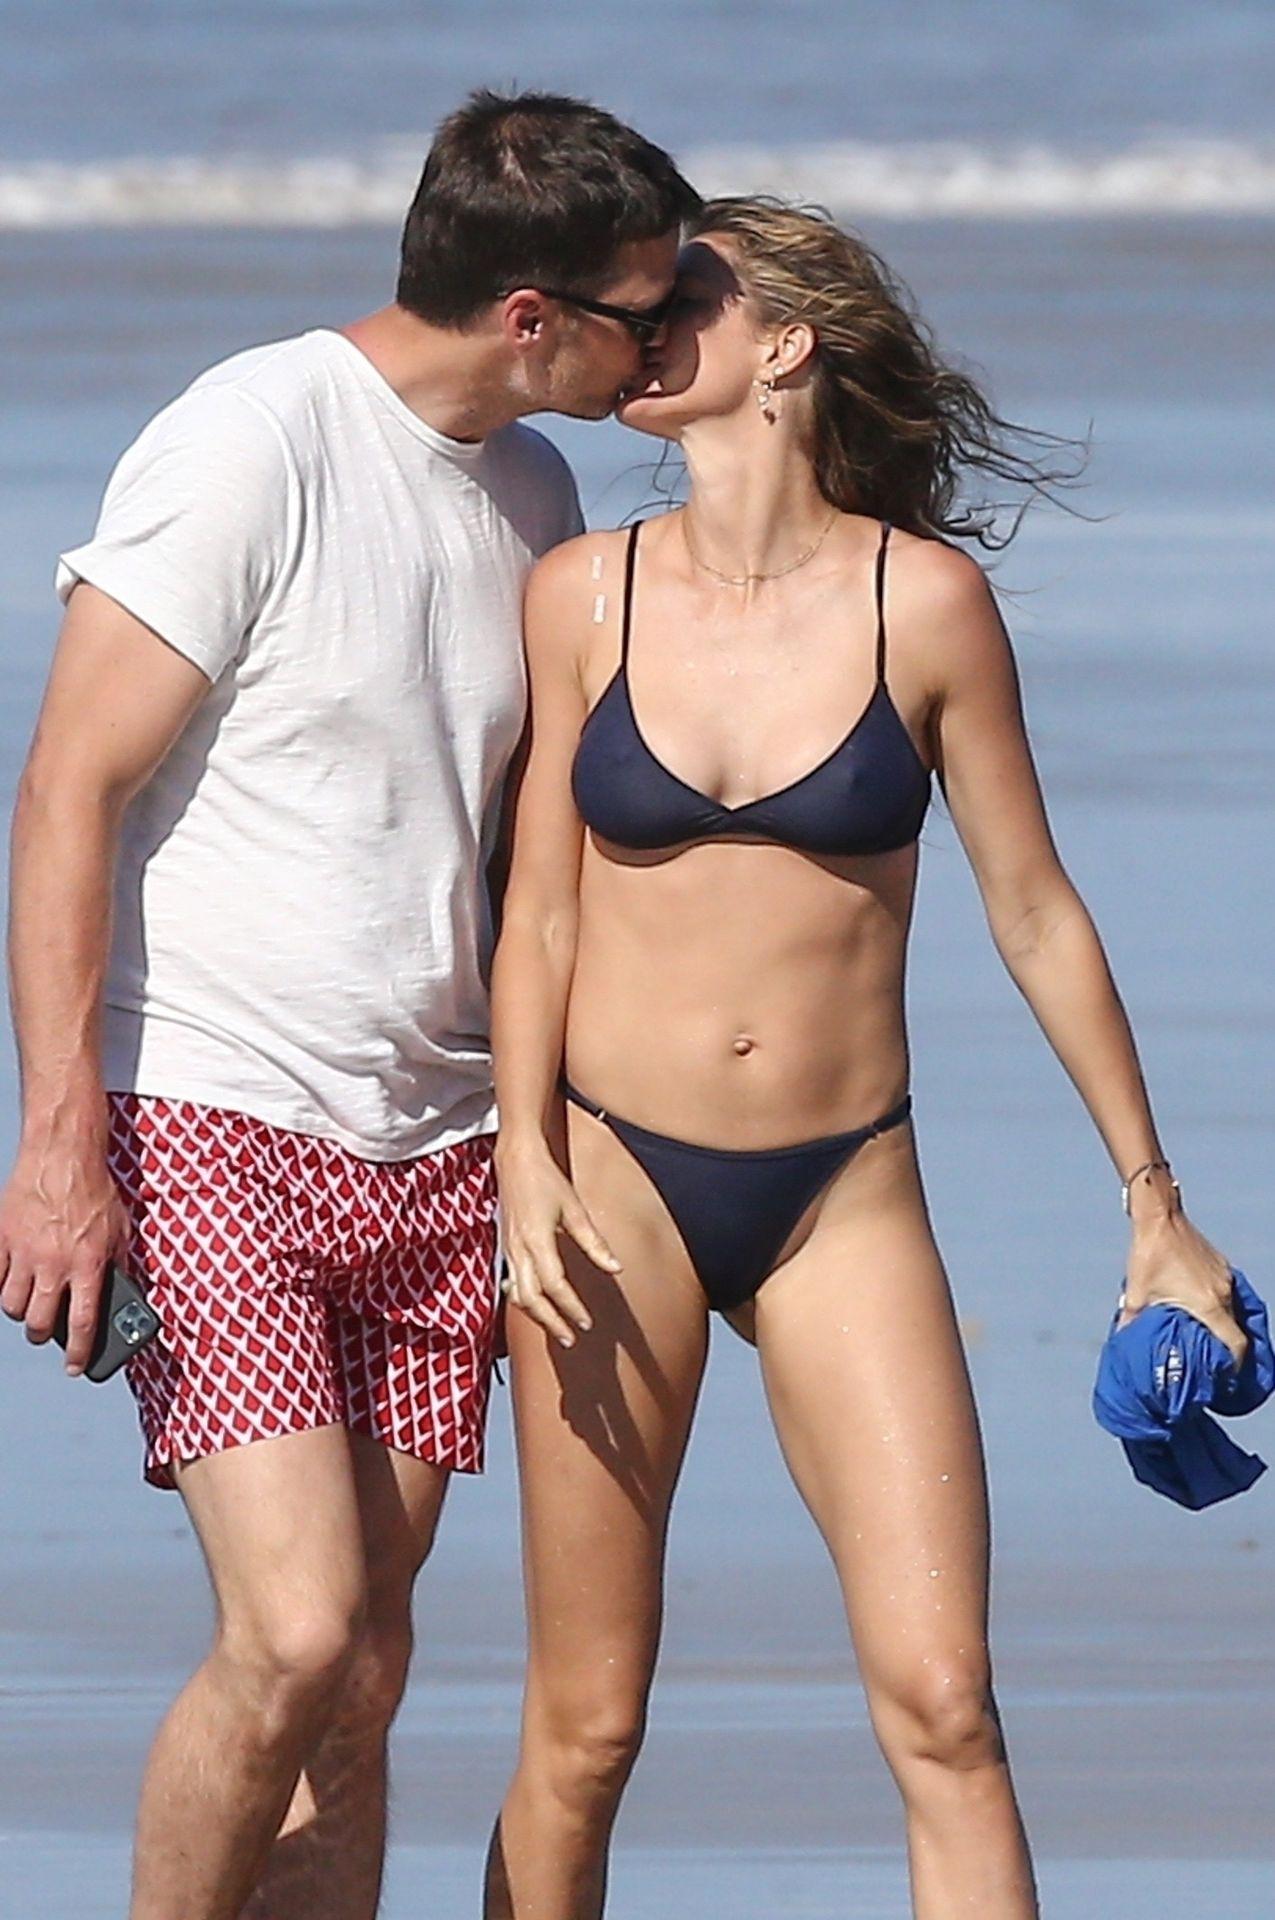 Tom Brady & Gisele Bundchen Pack On The Pda At The Beach 0028